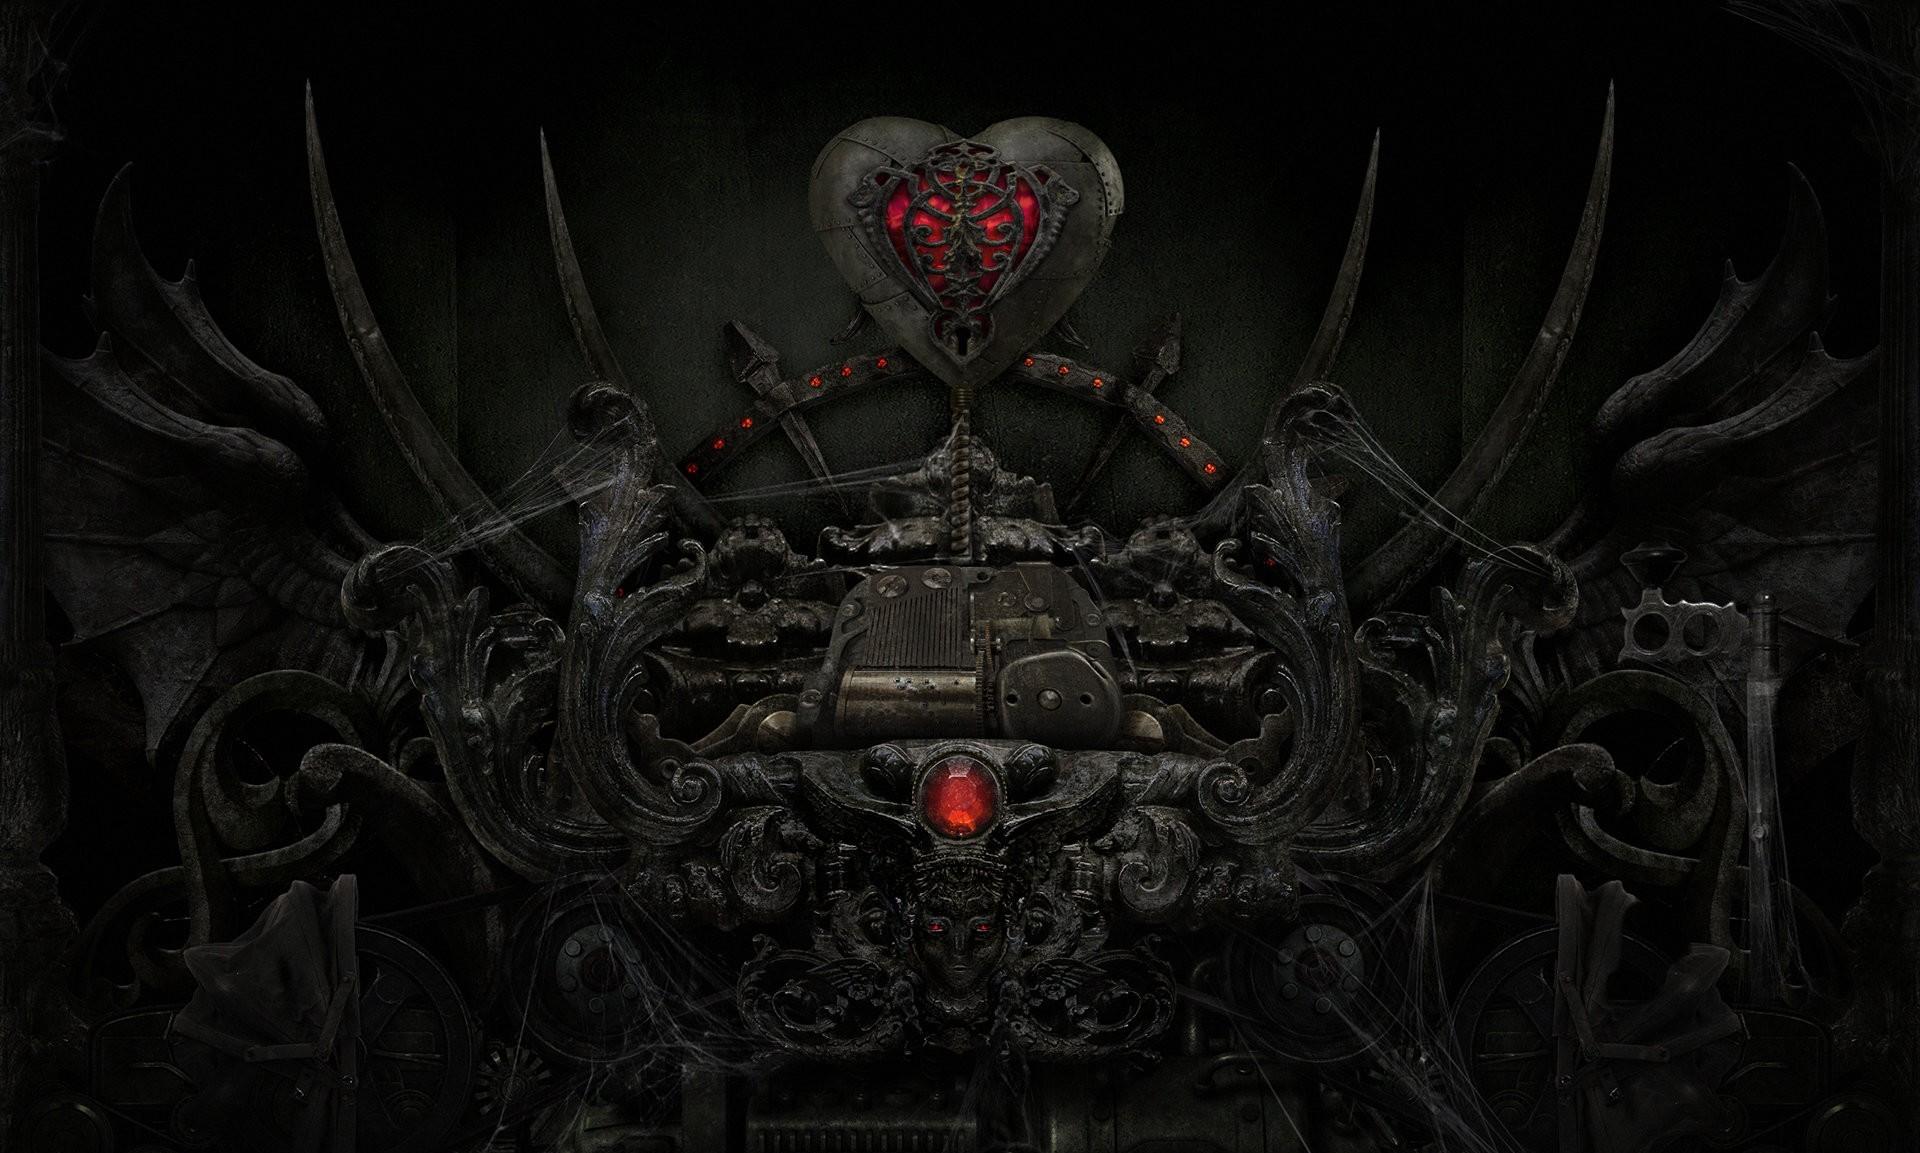 Download Dark Love Heart Evil Sci Fi Mech Gothic Wallpaper Background 1920x1153